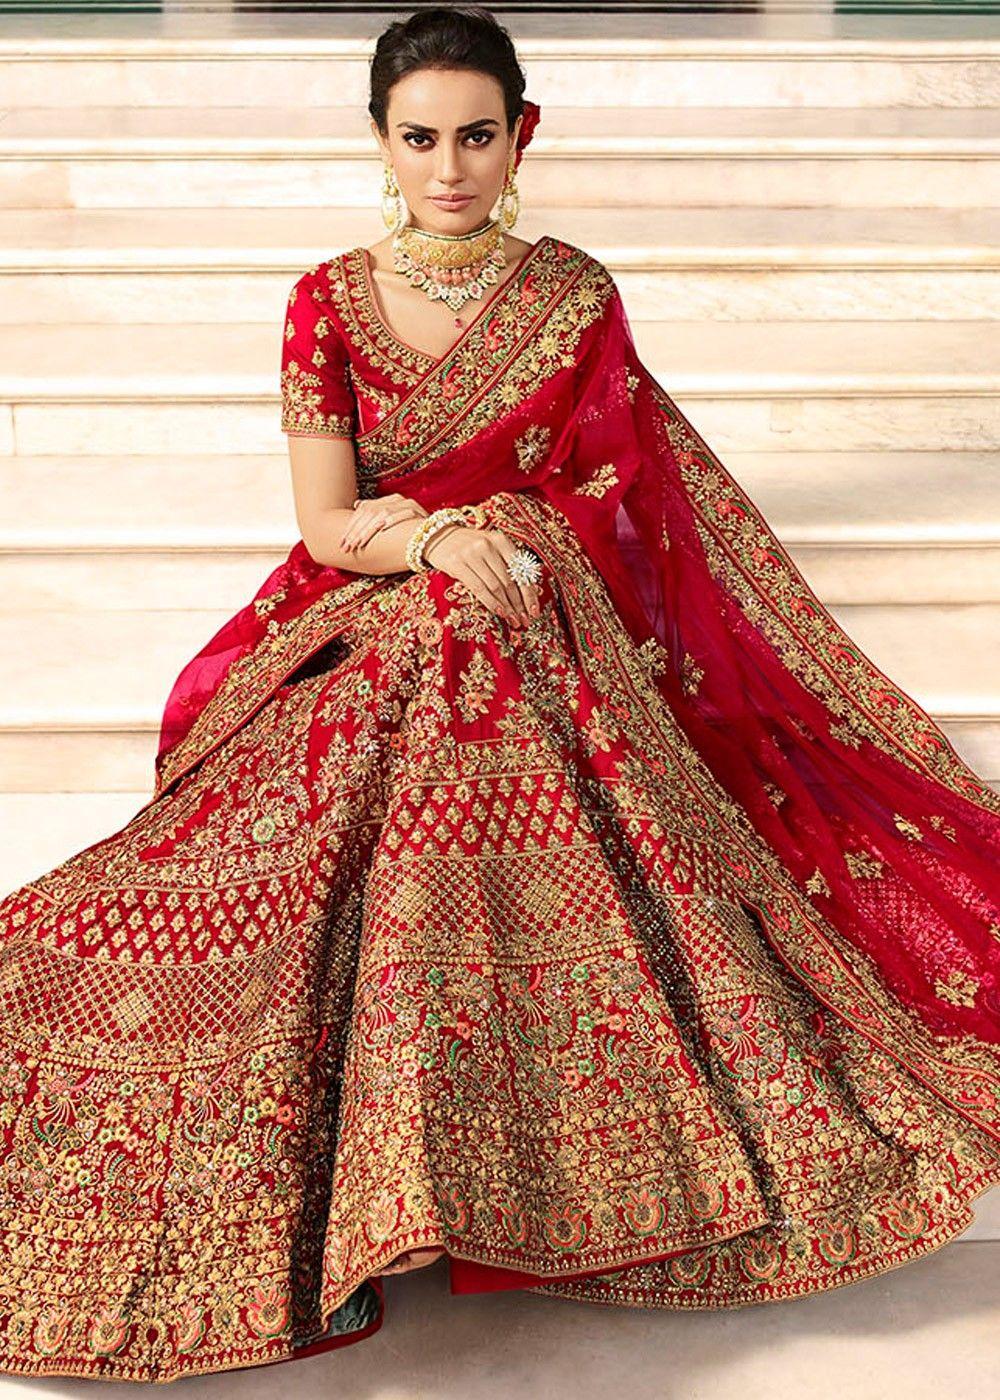 Surabhi Jyoti Maroon Bridal Lehenga Choli Bridal lehenga red